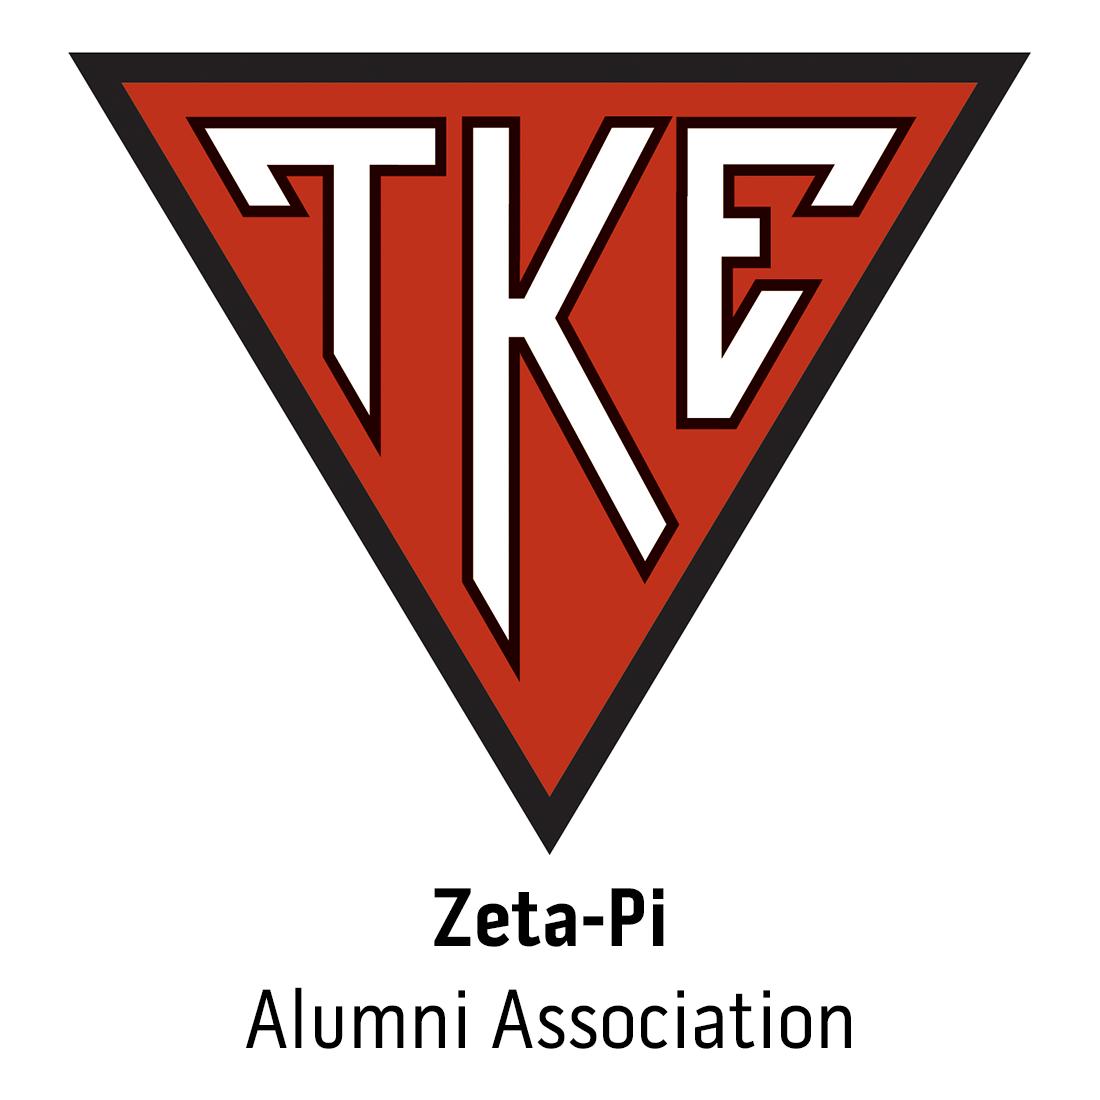 Zeta-Pi Alumni Association Alumni at Culver-Stockton College